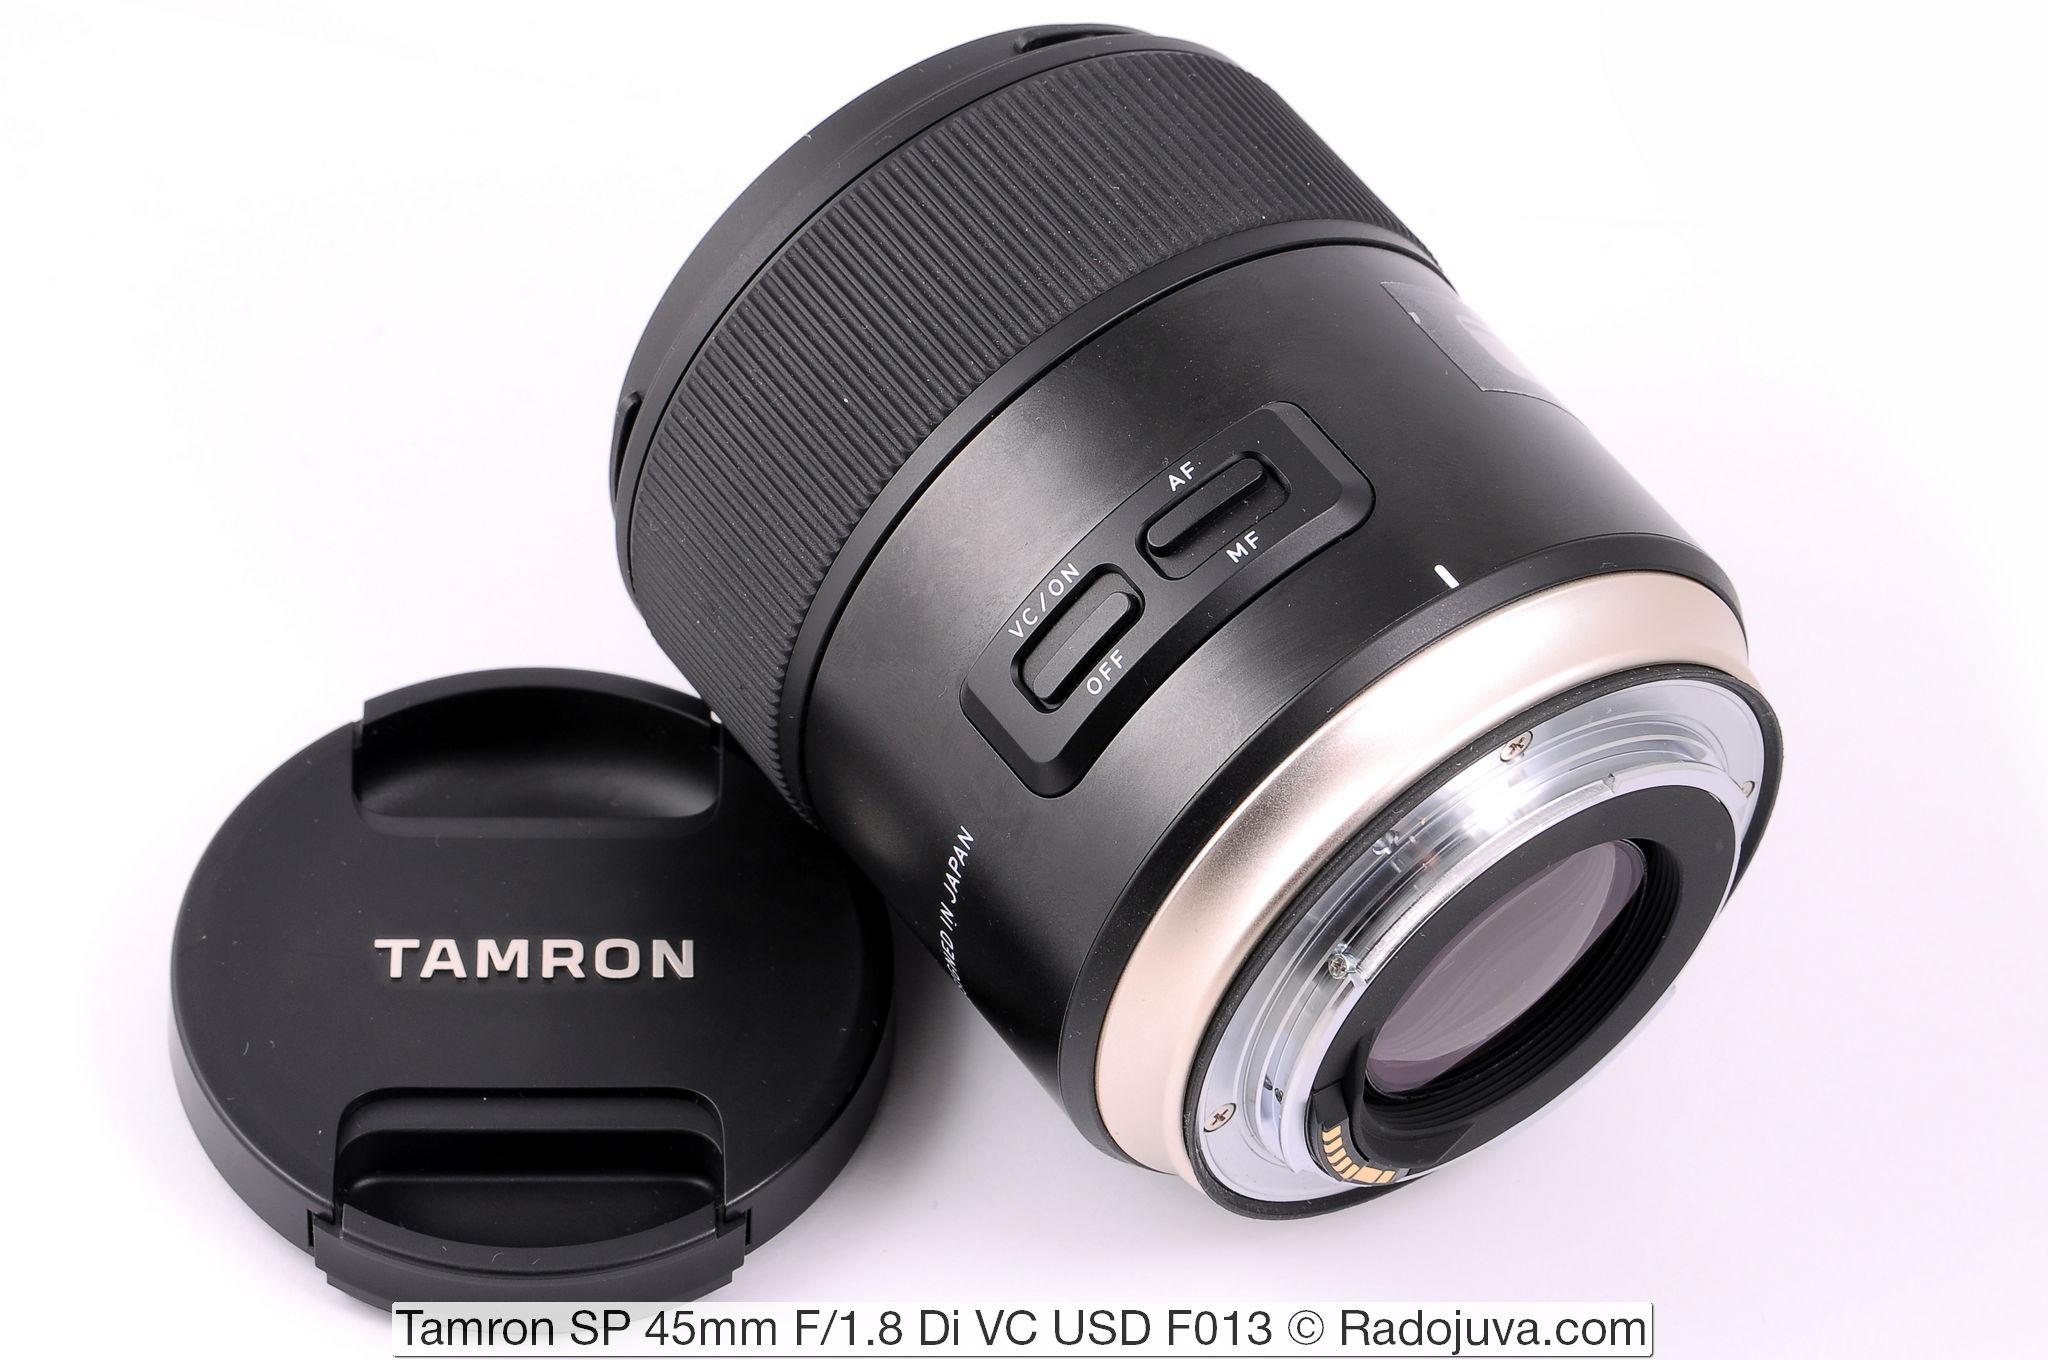 Tamron SP 45mm F/1.8 Di VC USD F013. Передняя крышка изготовлена в Японии.